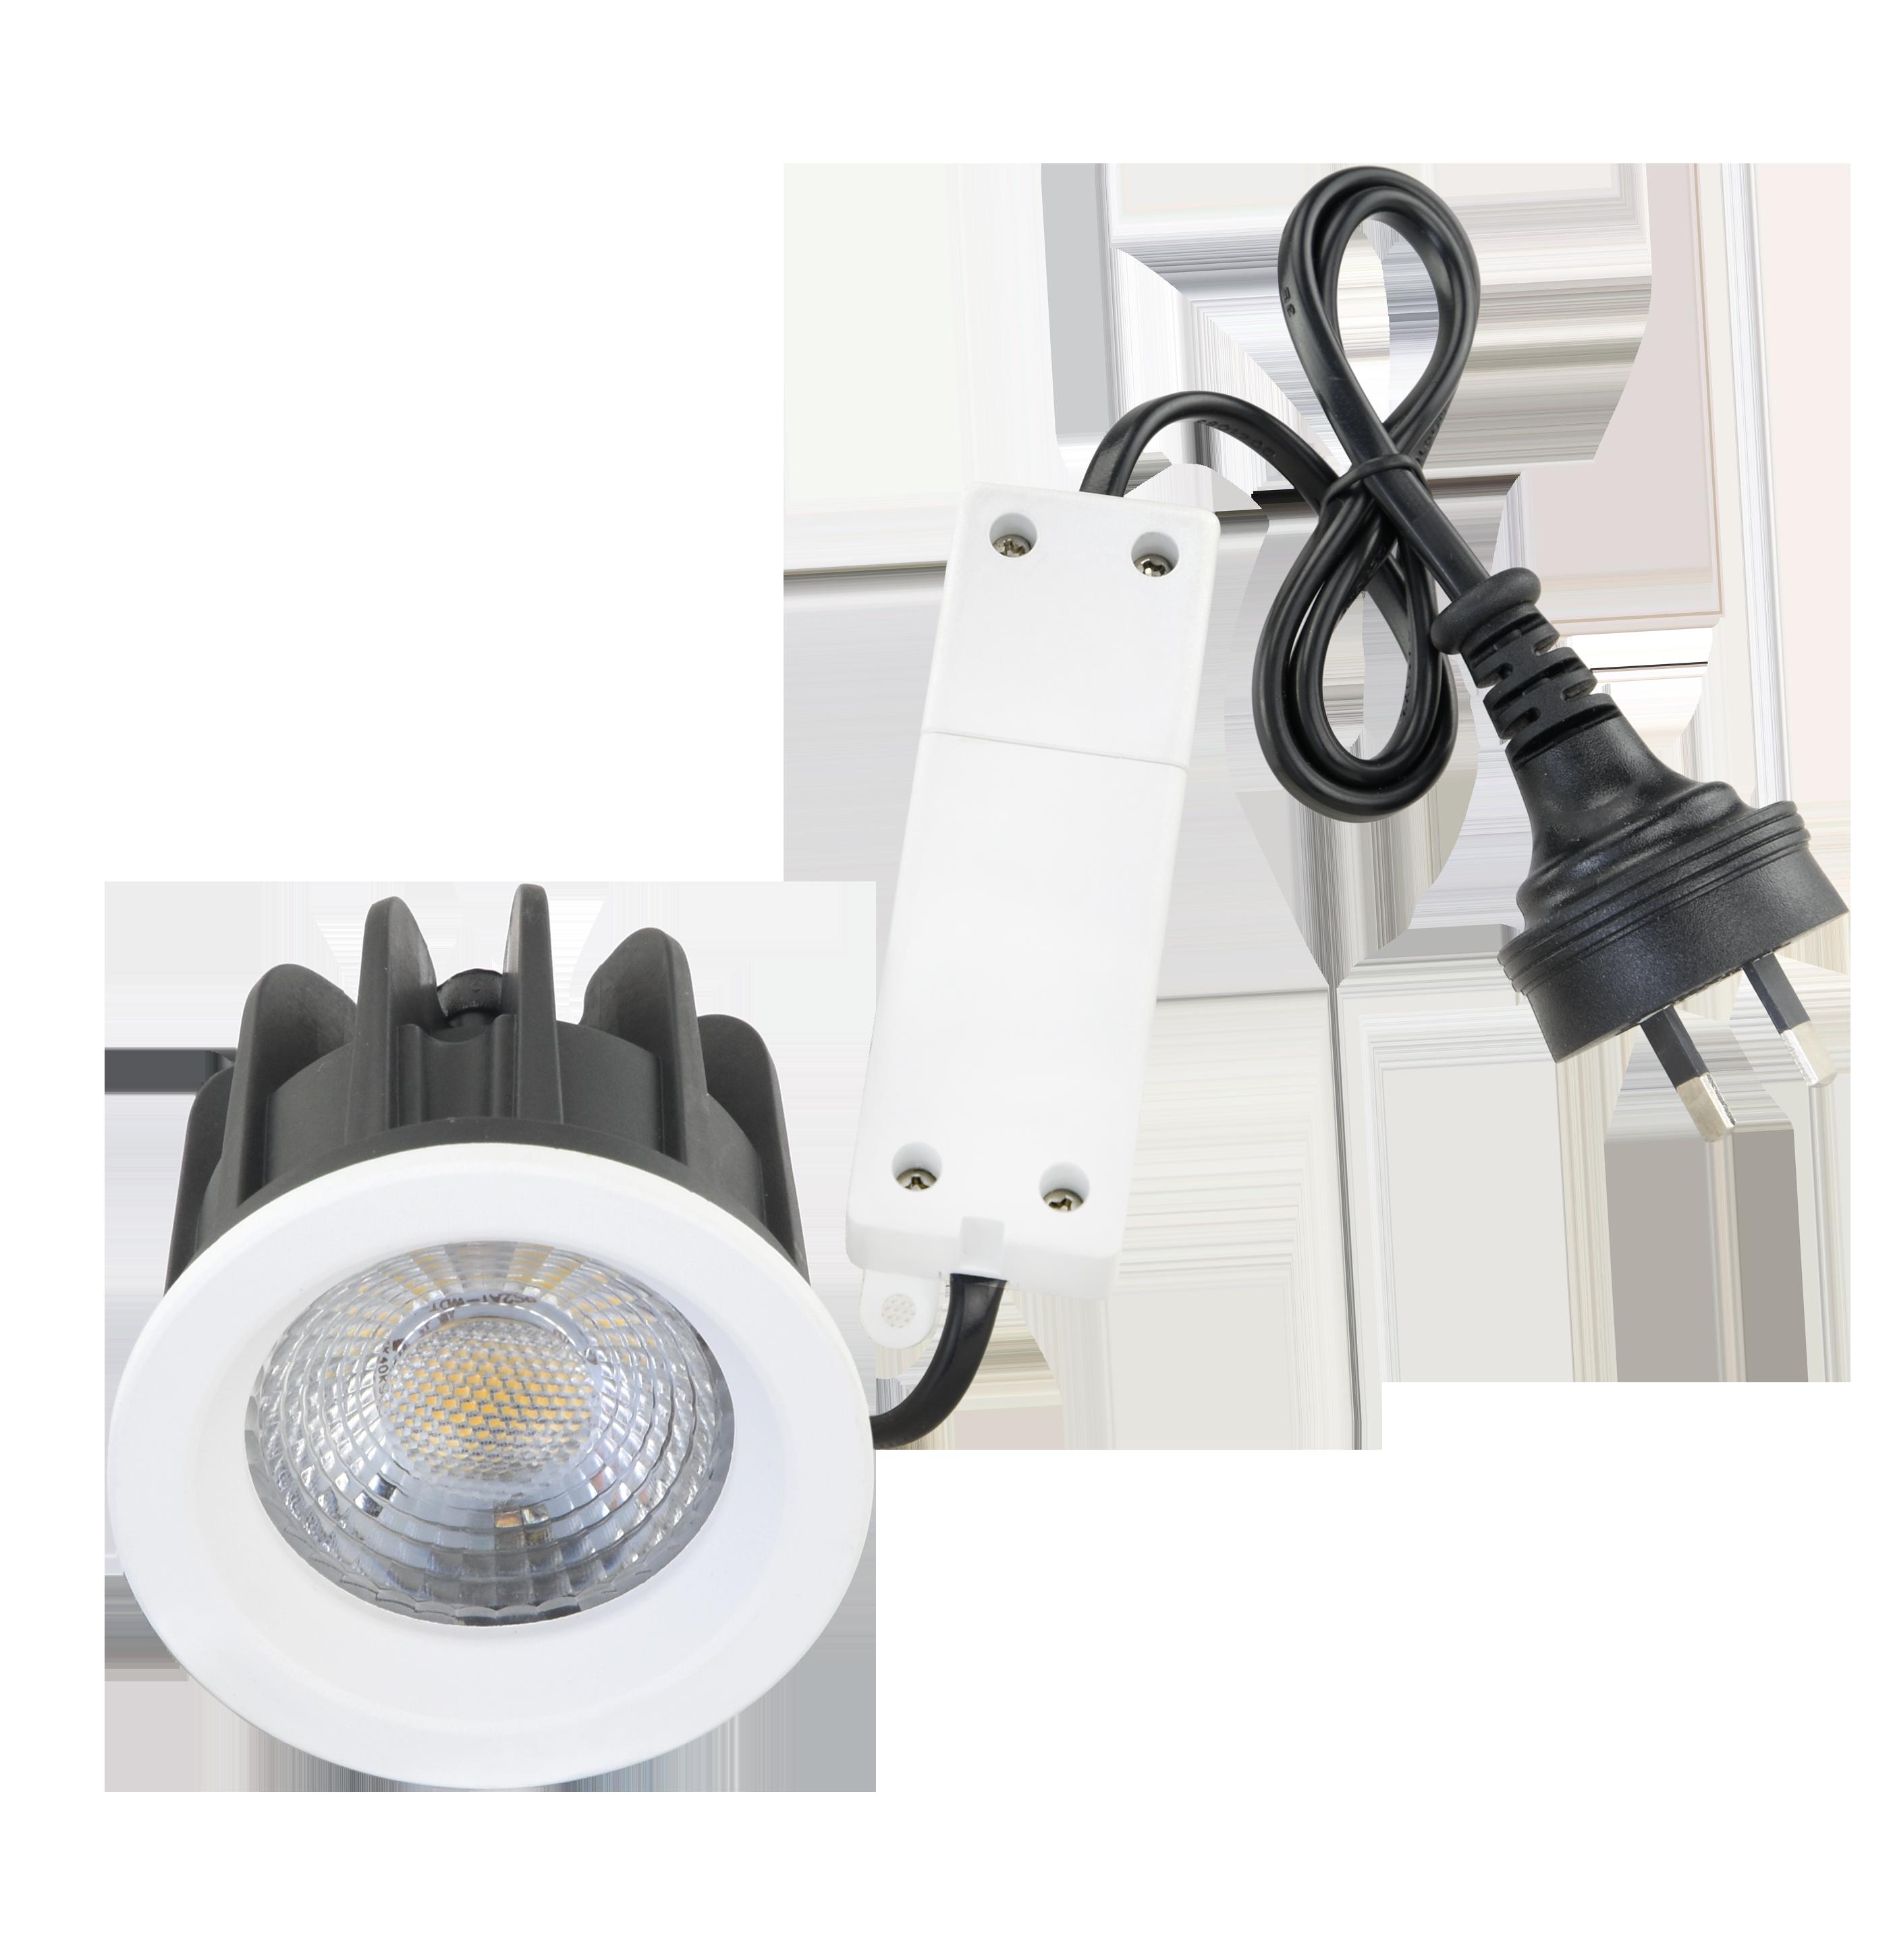 Emilite Mini Modular Adjustable Downlight